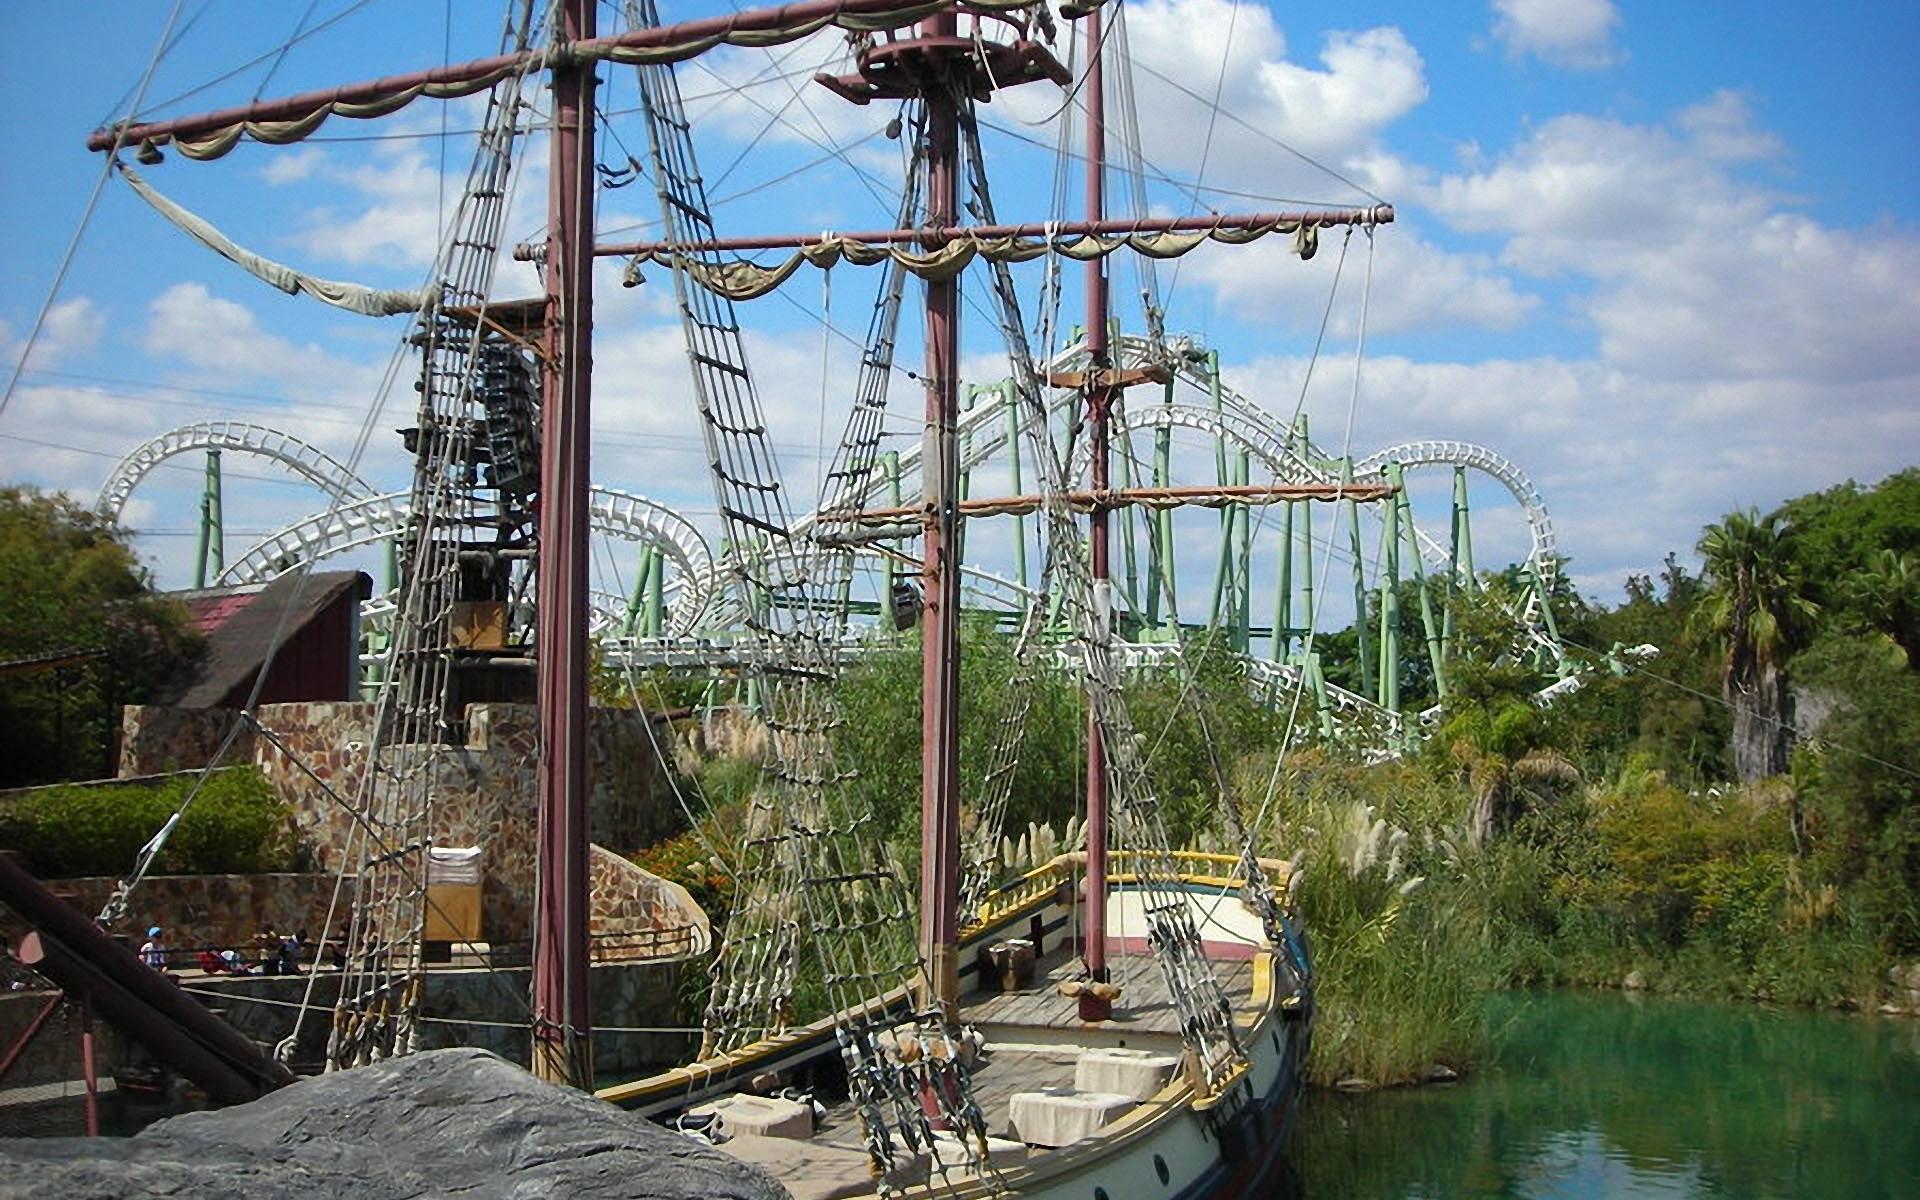 Entradas y ofertas isla m gica y agua m gica - Isla magica ofertas ...